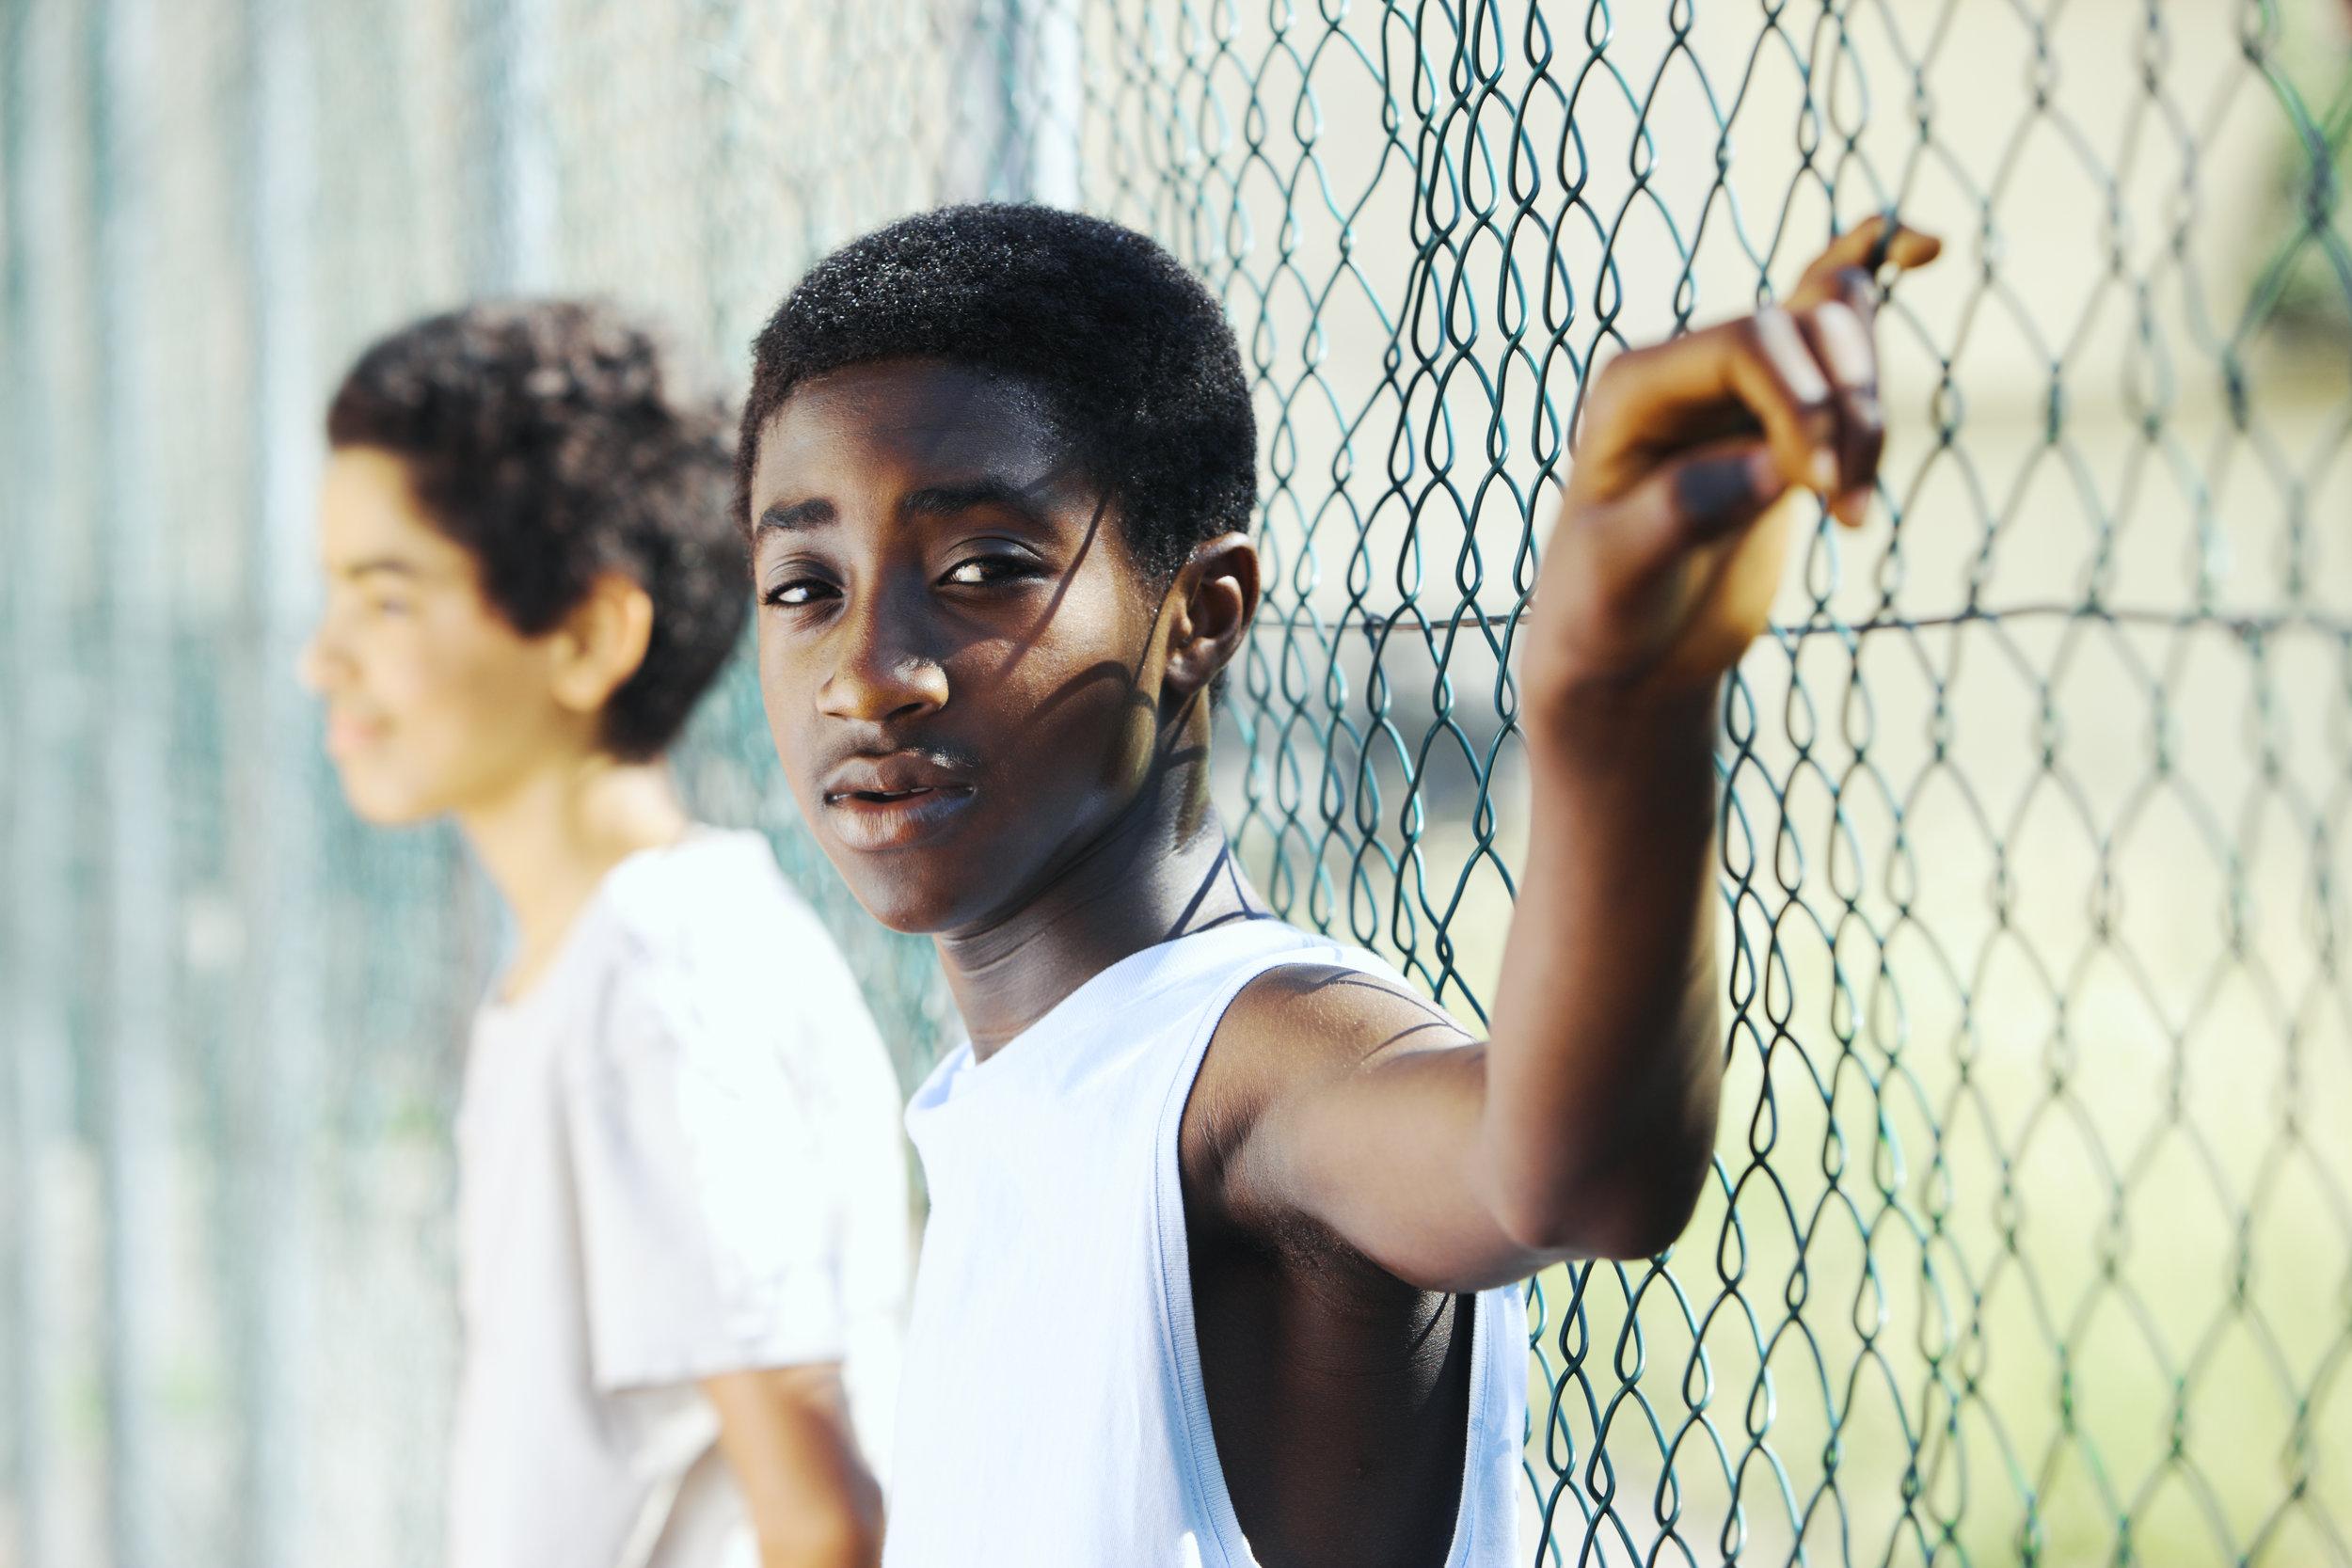 african-boys-PJU7TRC.jpg